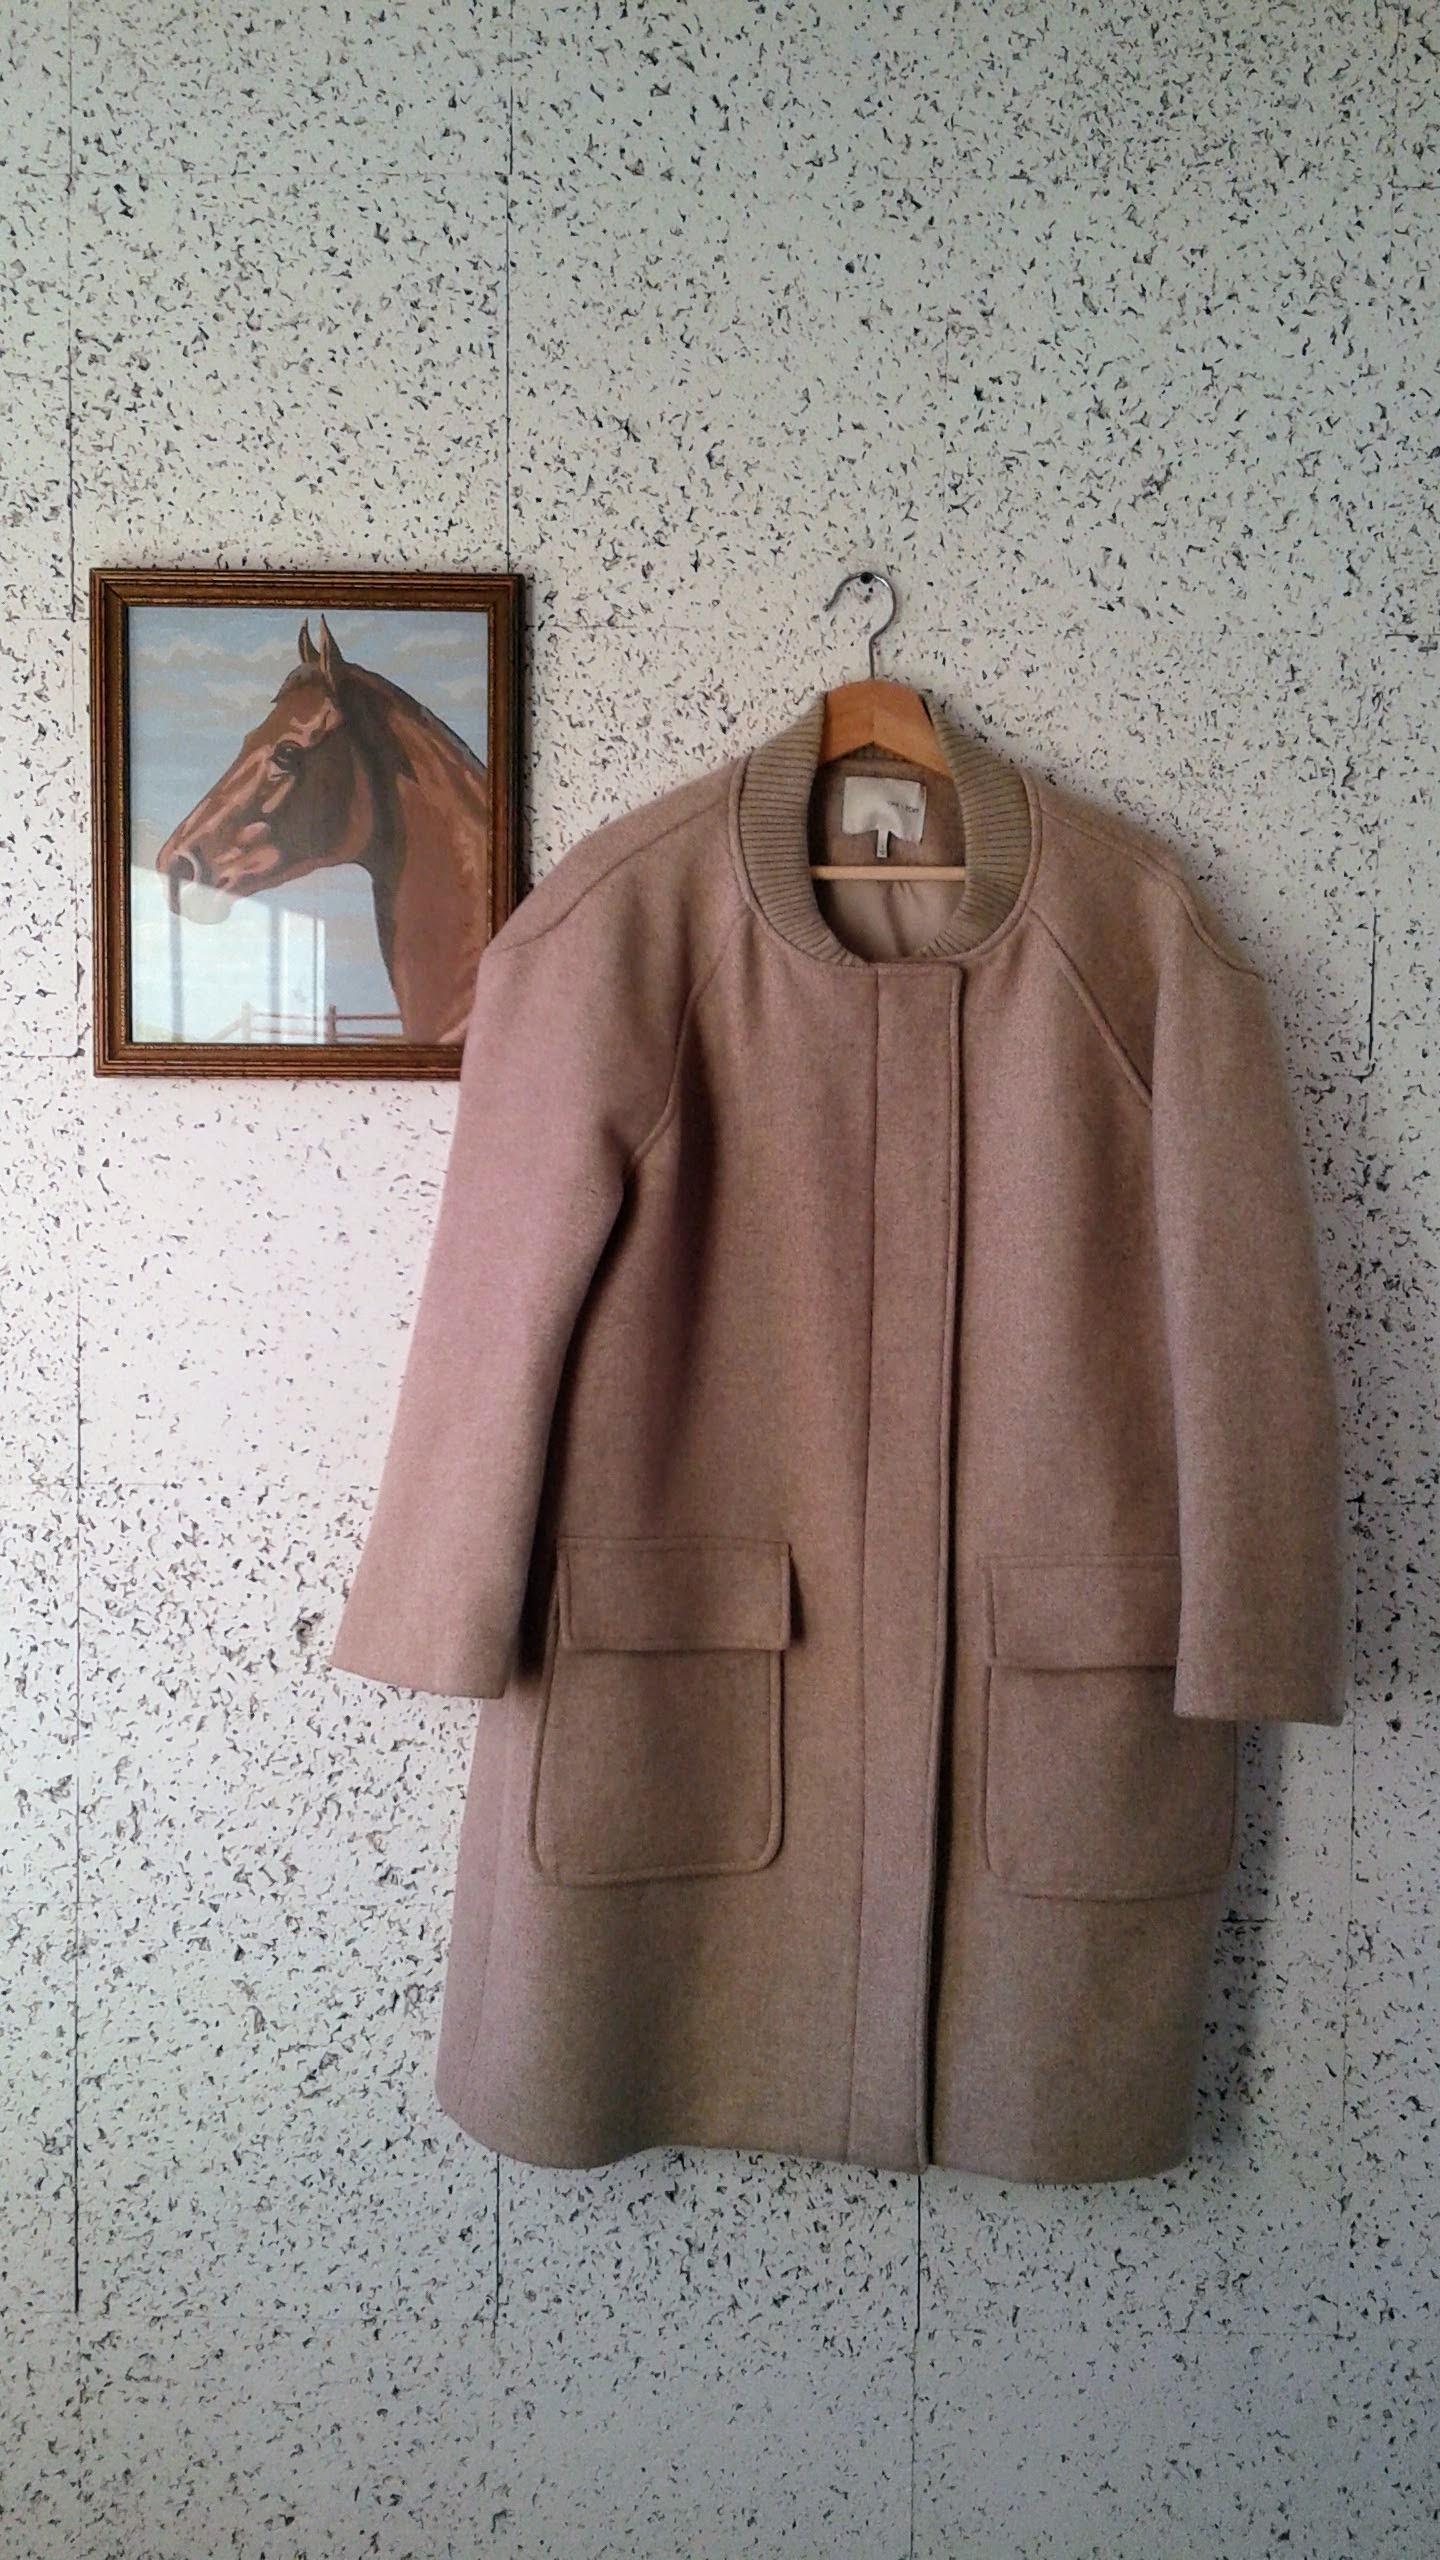 Oak+Fort coat; Size S, $145